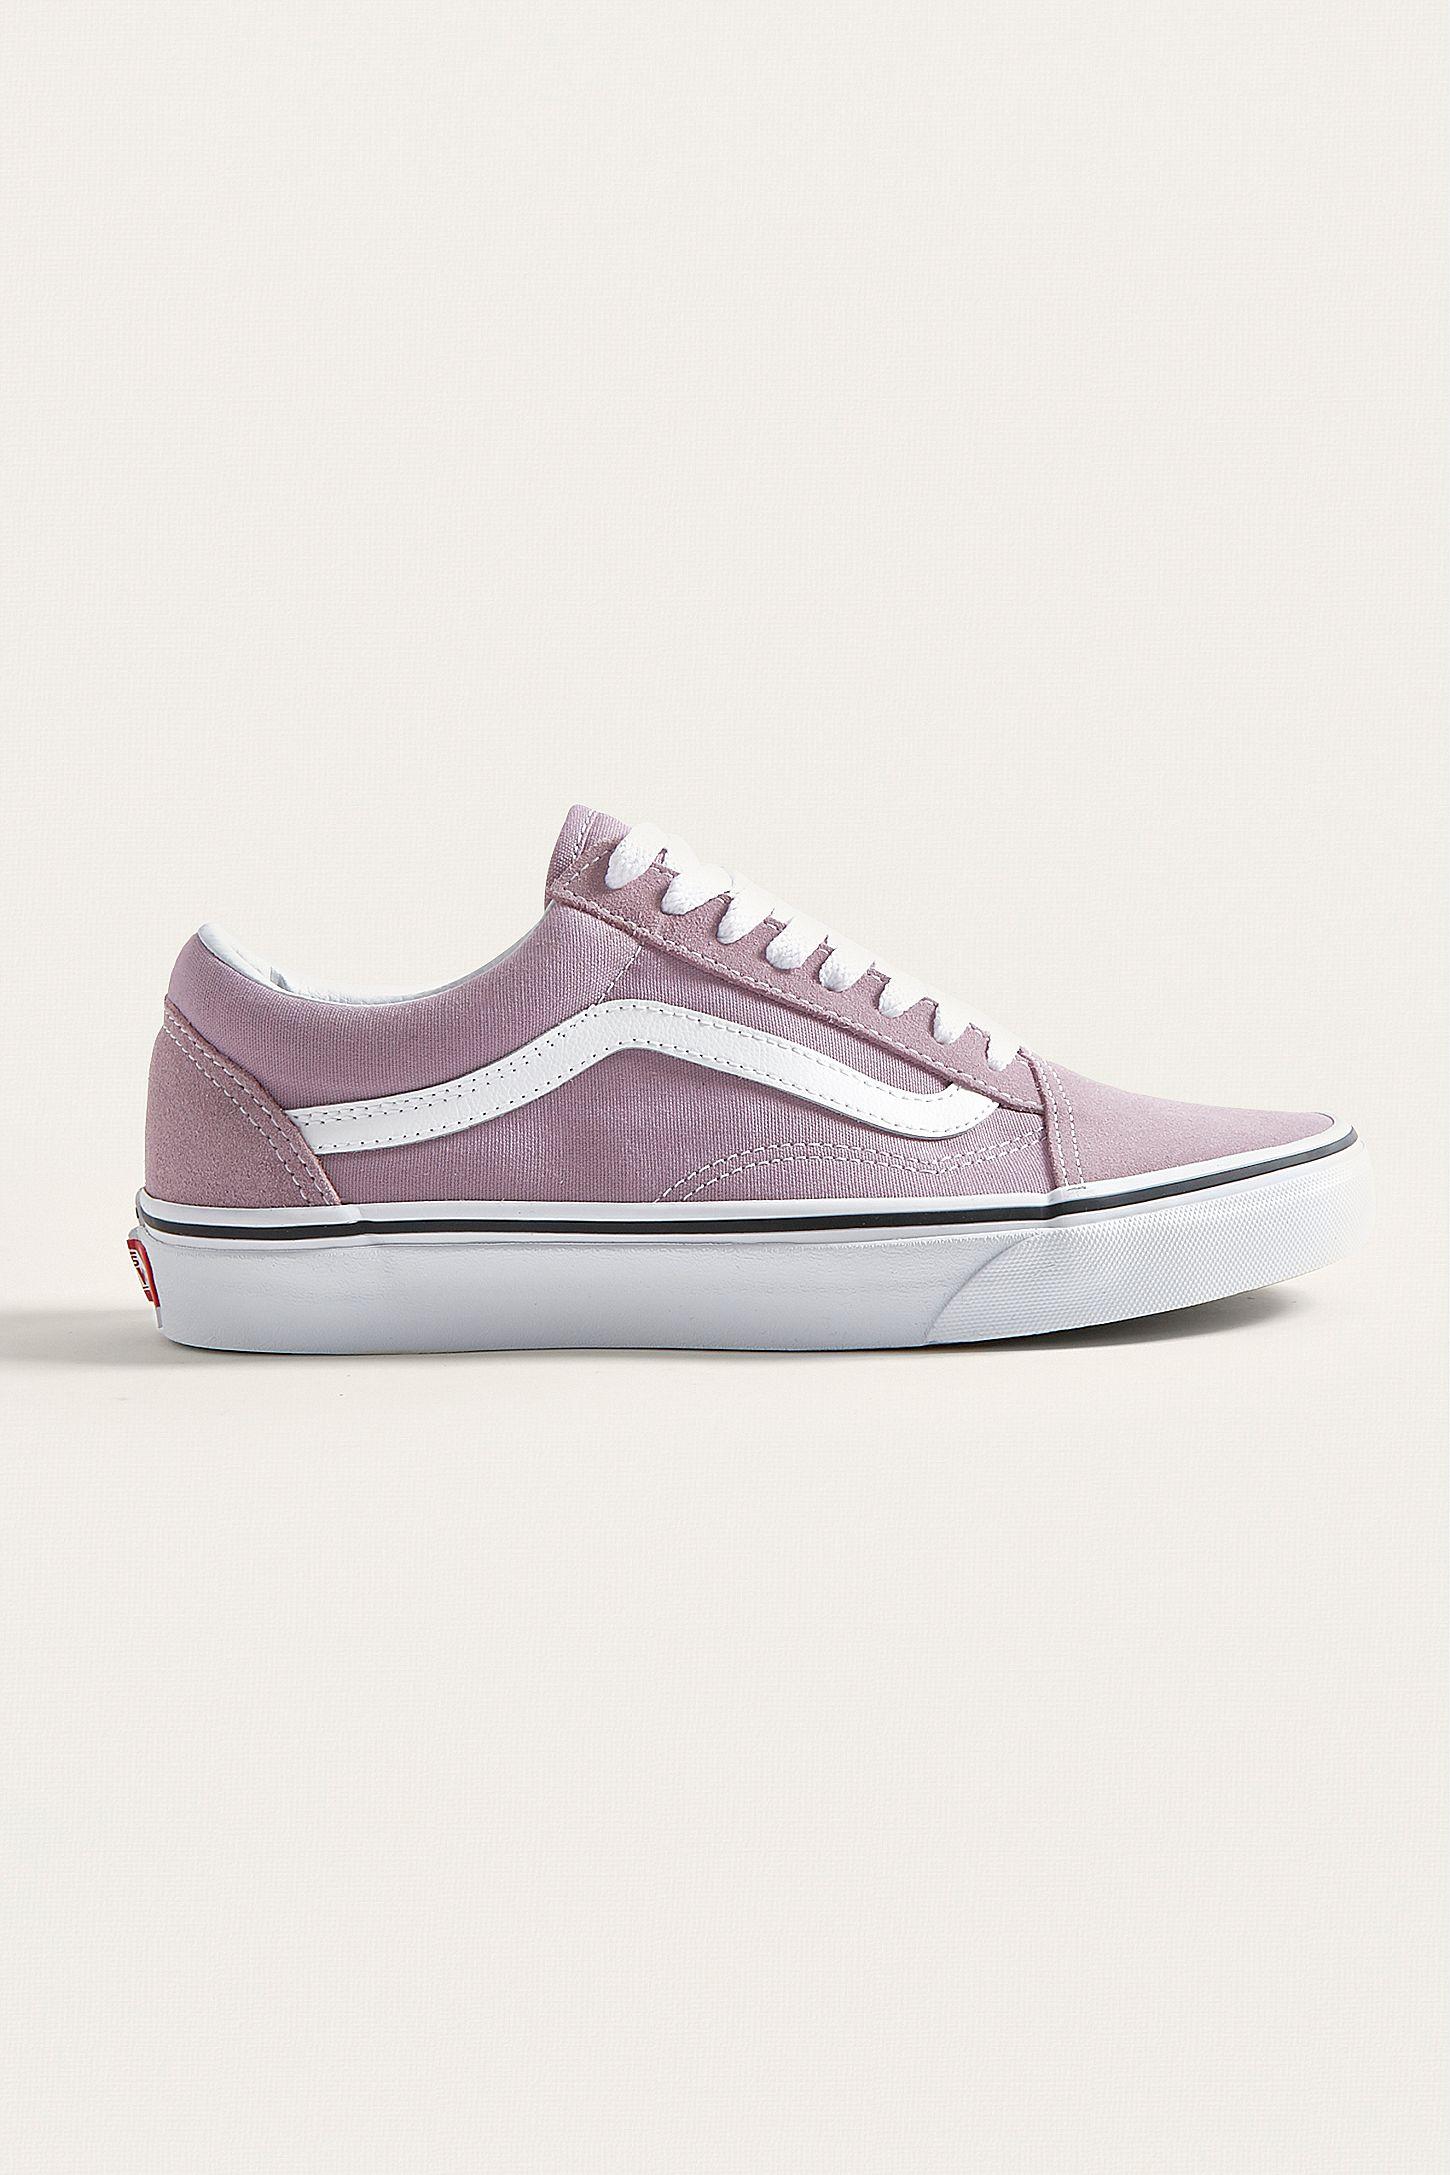 e442b20956 Vans Old Skool Purple Trainers